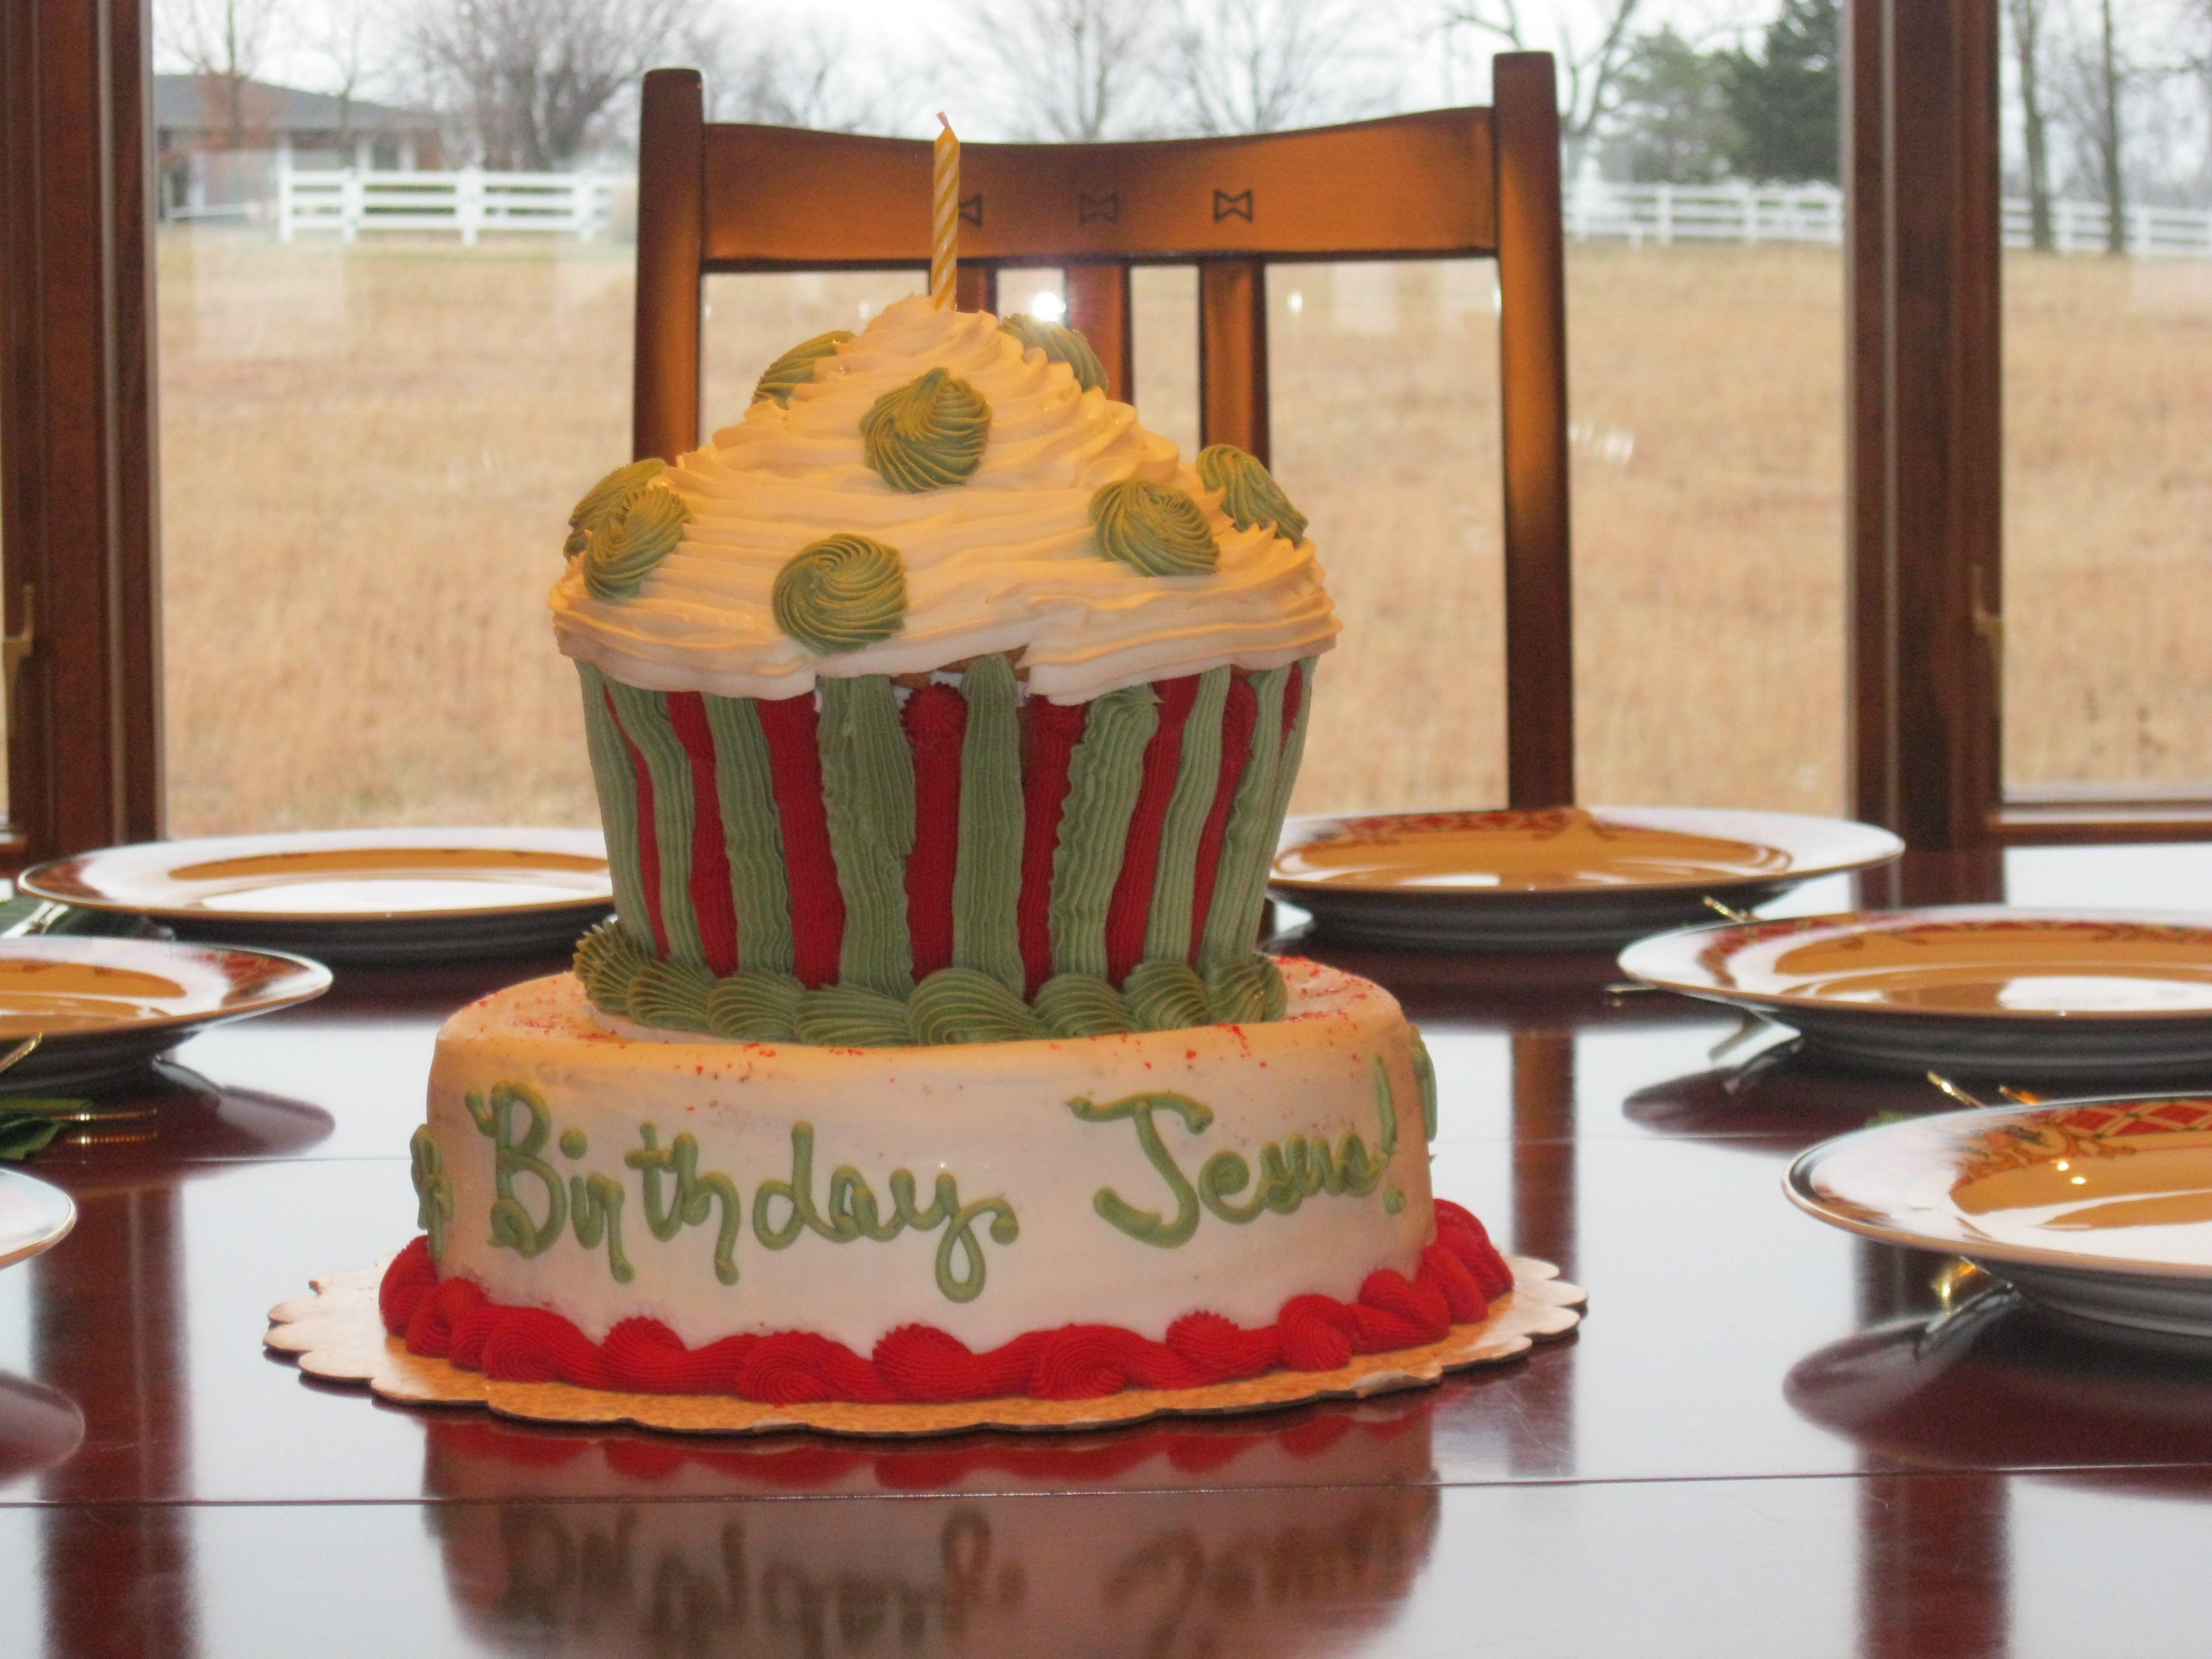 Happy birthday jesus cake 2011 jesus birthday cake